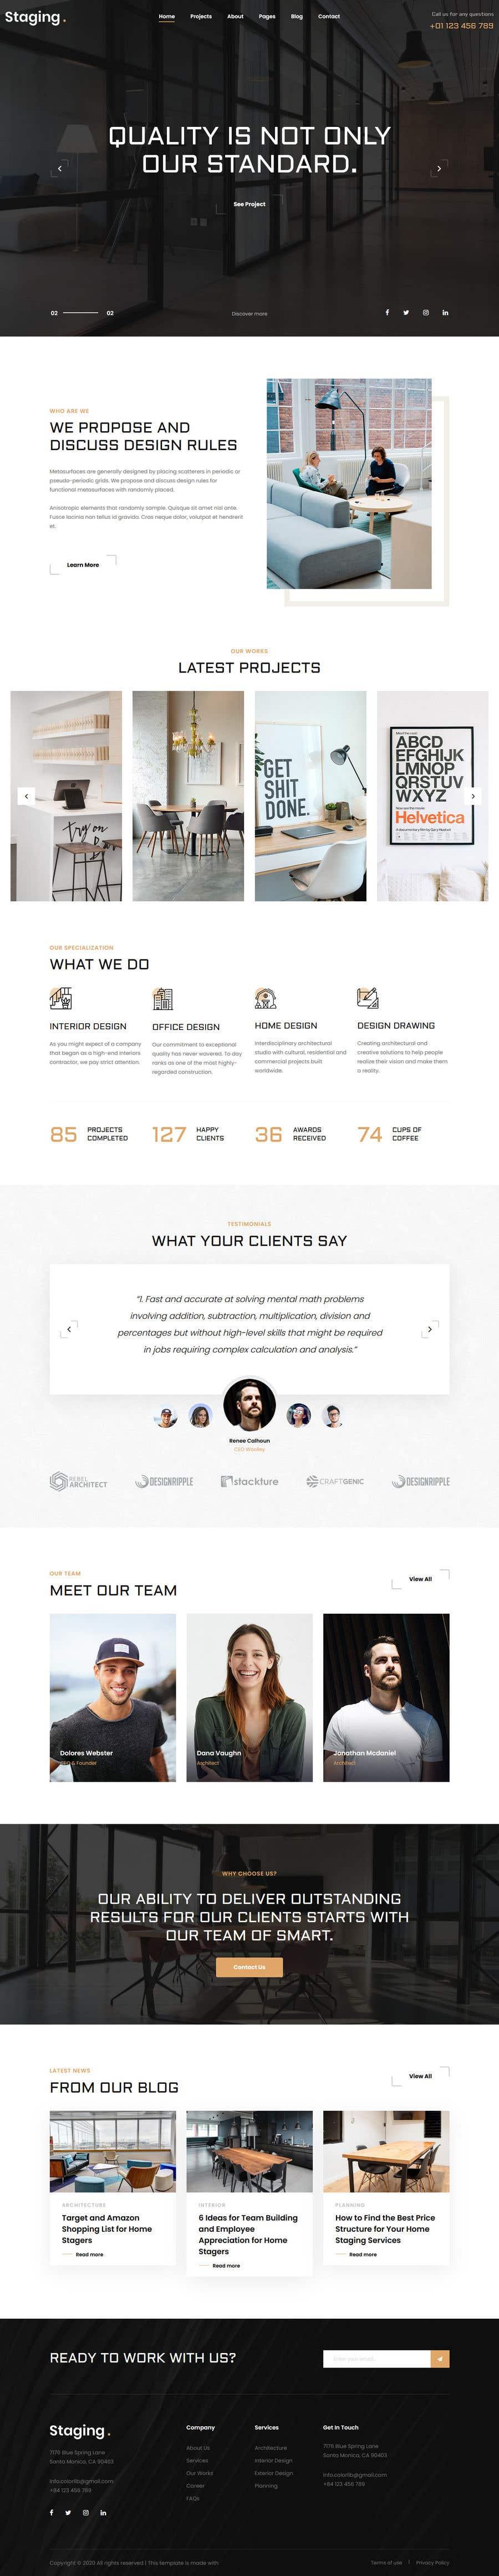 Konkurrenceindlæg #                                        13                                      for                                         Looking for best Website Landing Page Designer for My Product Landing Page